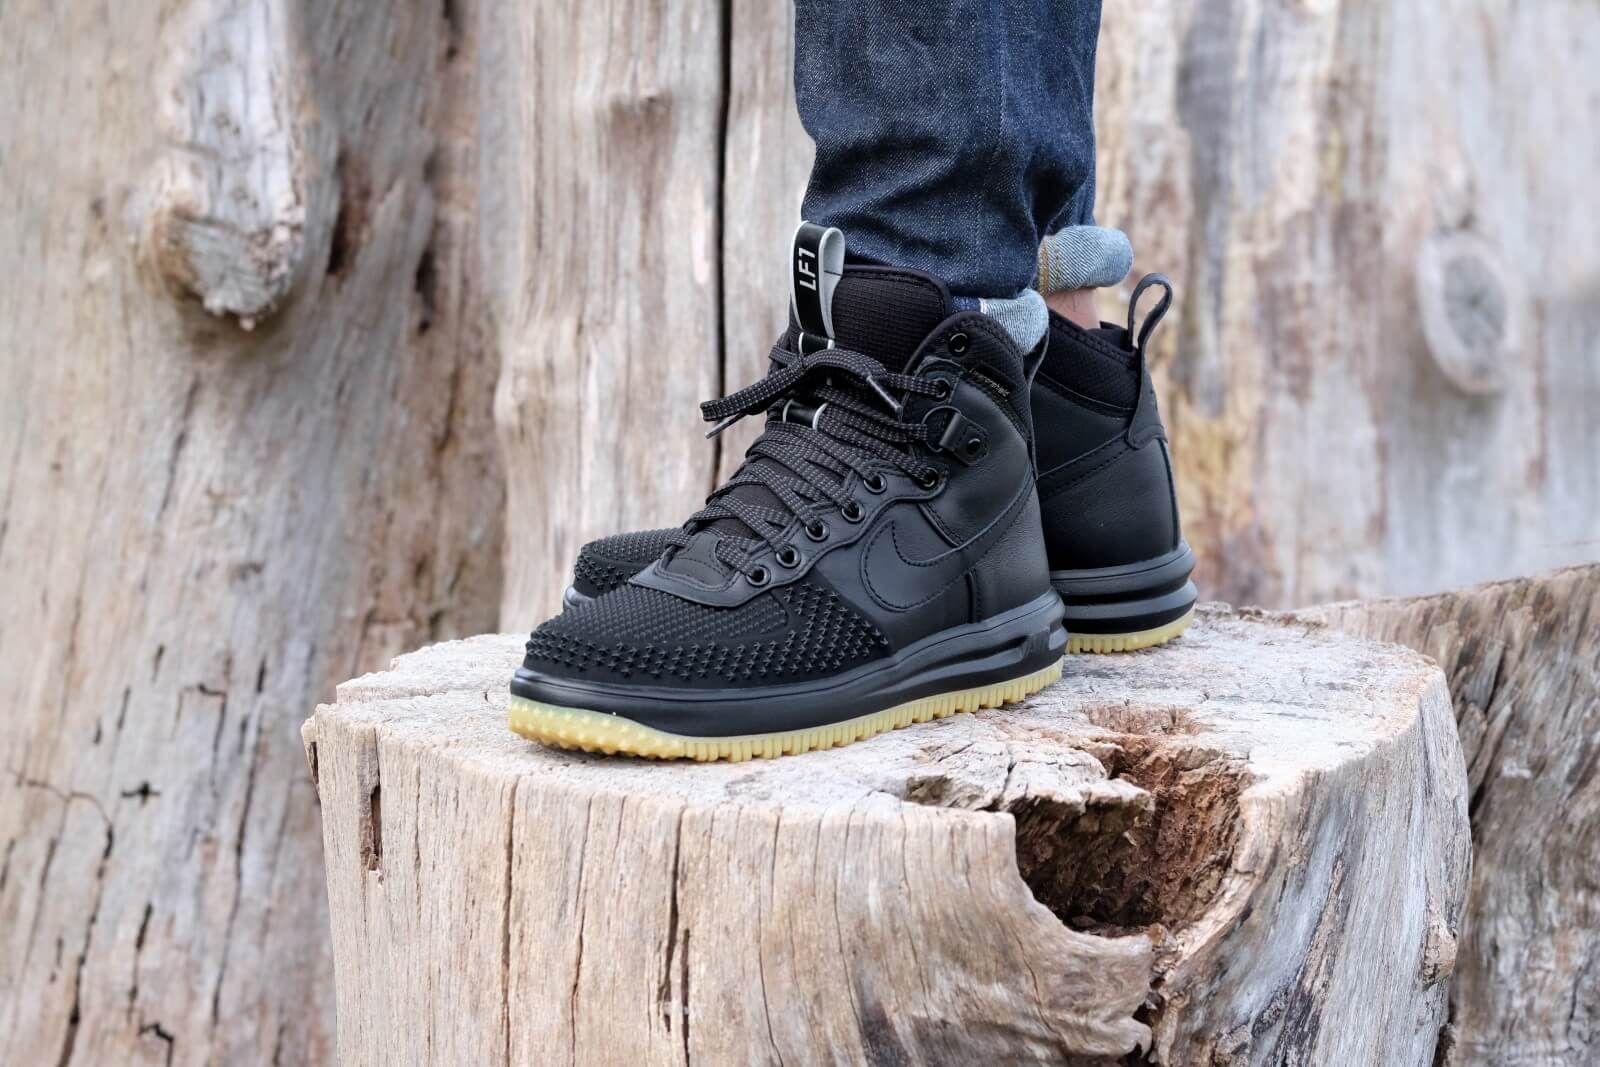 Hight Quality Nike Hyperdunk 2013 Lunar Black Metallic Silver Pu